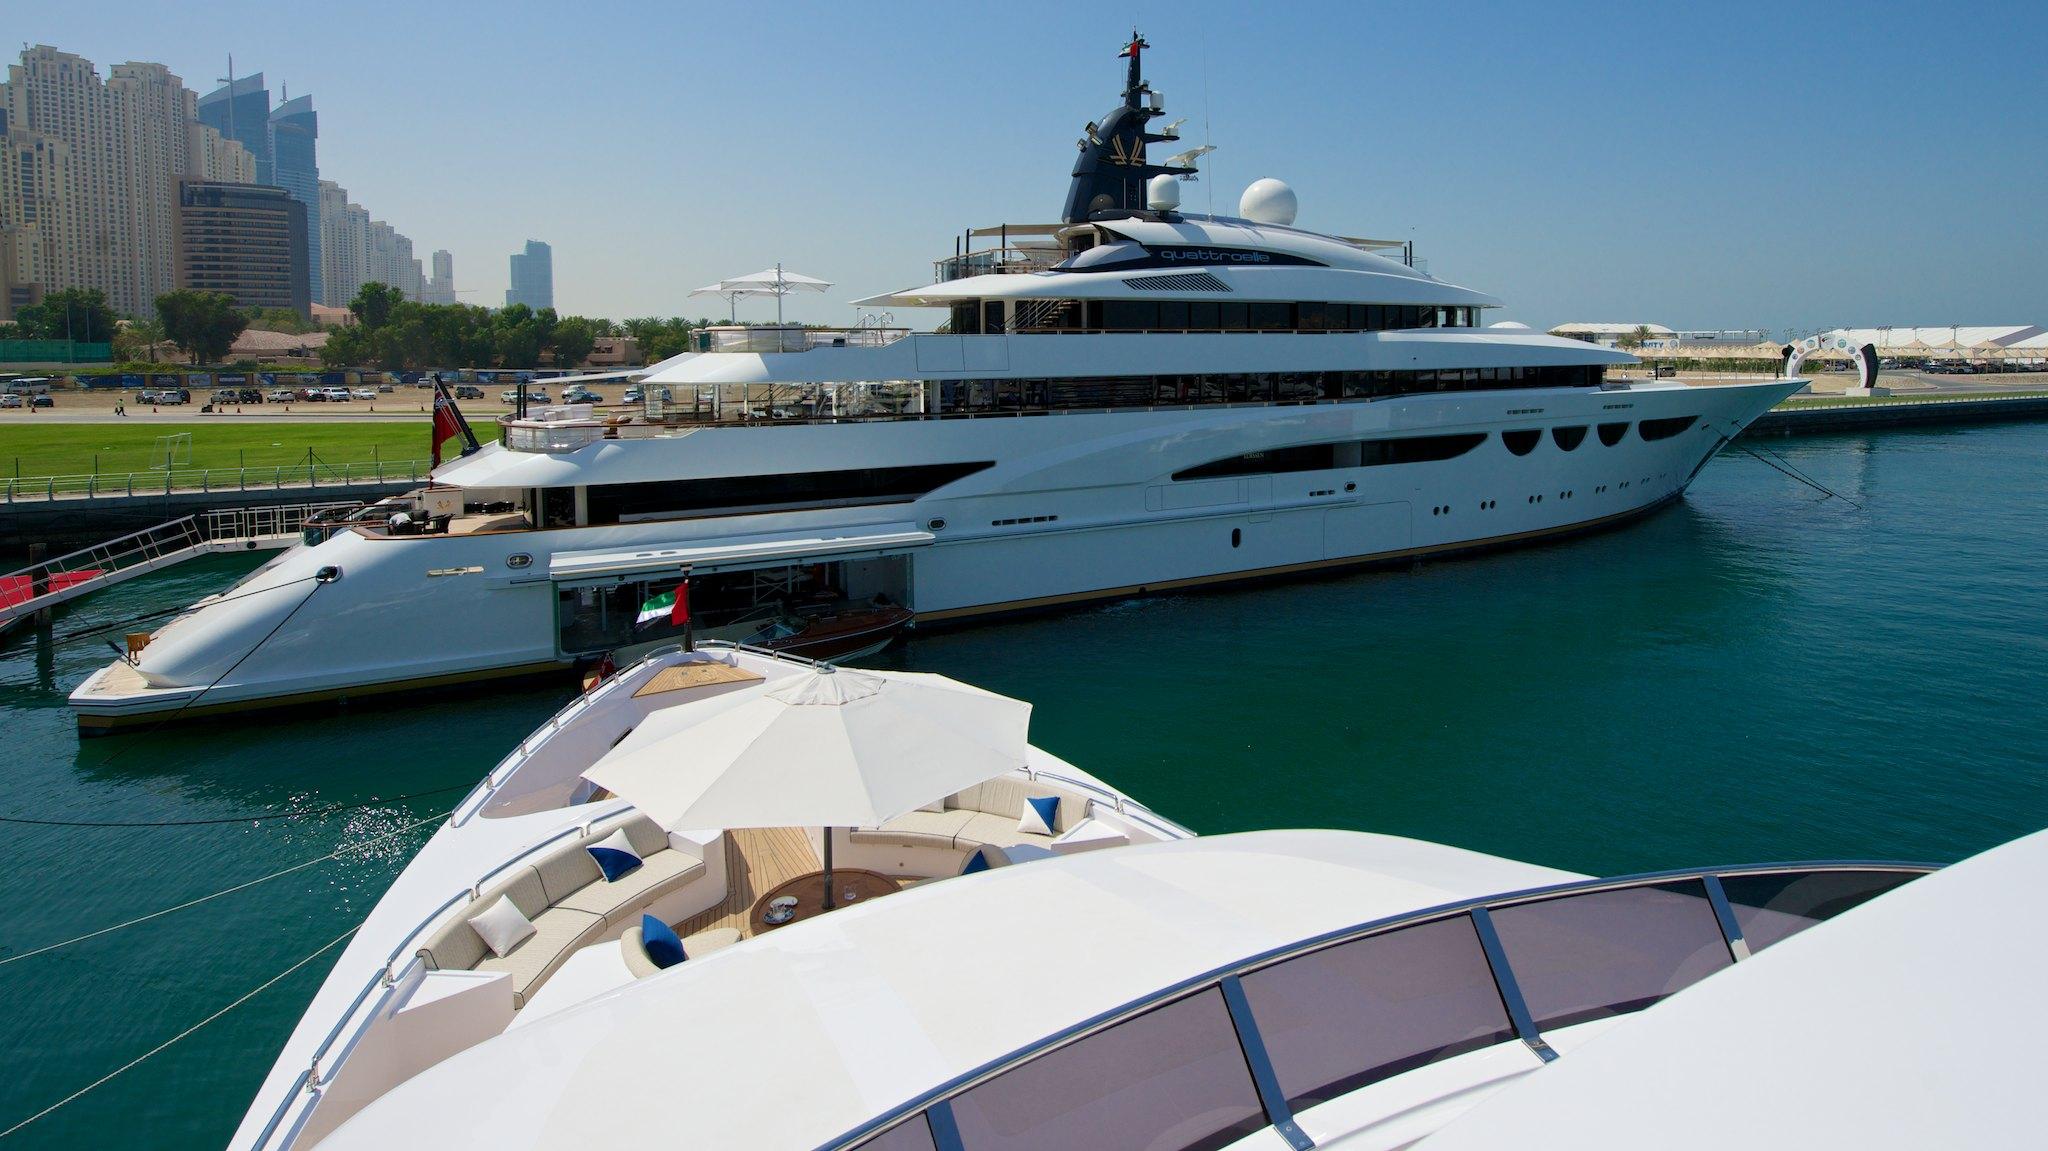 Luxury superyacht keyla interior by hot lab luxury yacht charter - Lurssen Mega Yacht Quattroelle On Display At The 2014 Dubai Boat Show